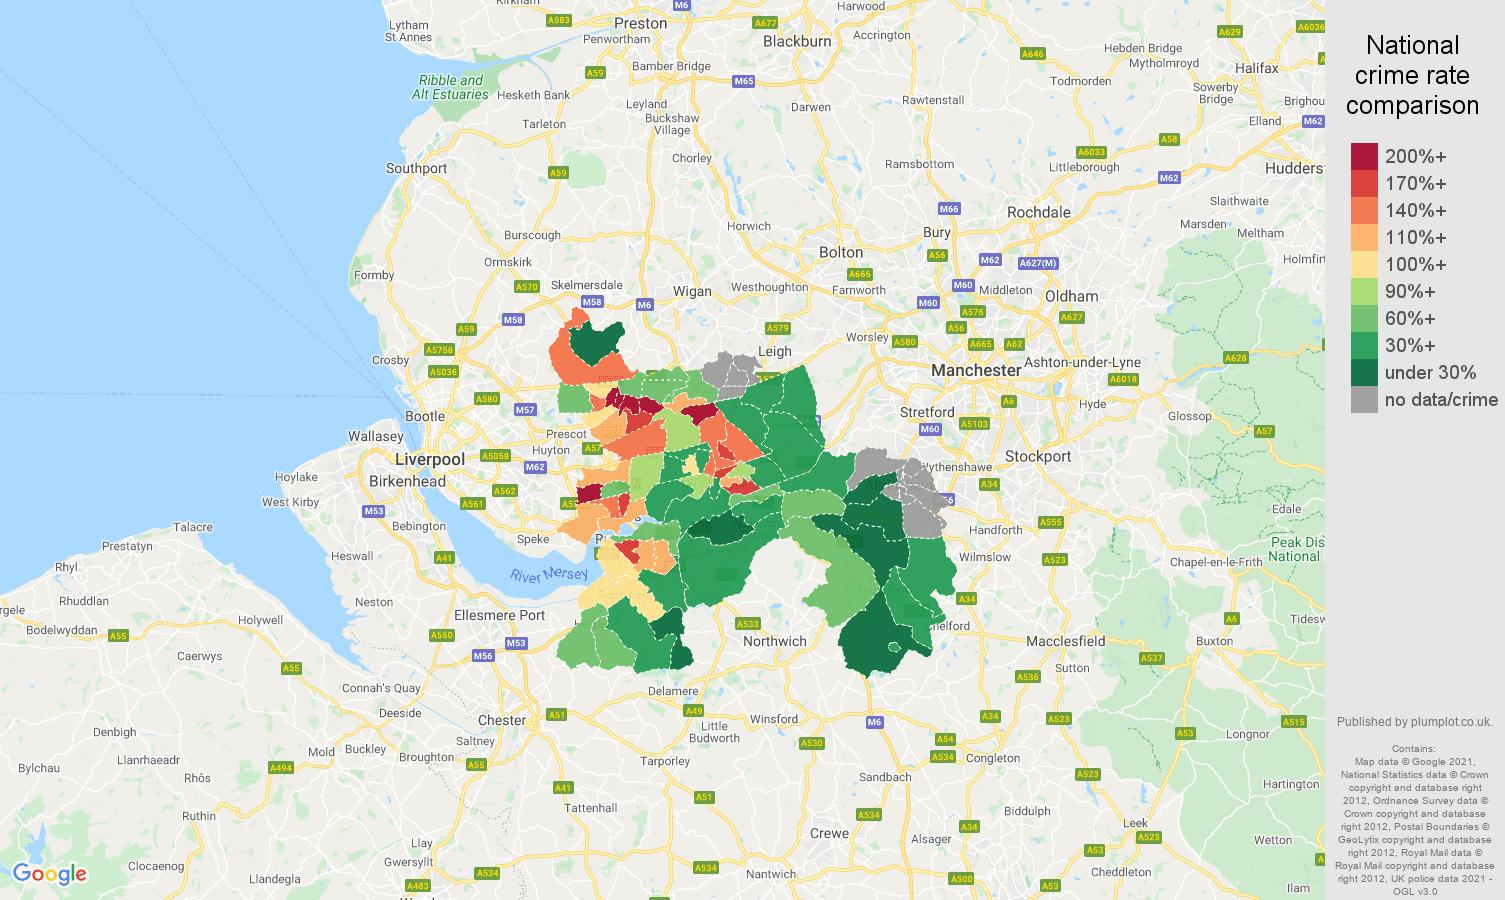 Warrington criminal damage and arson crime rate comparison map